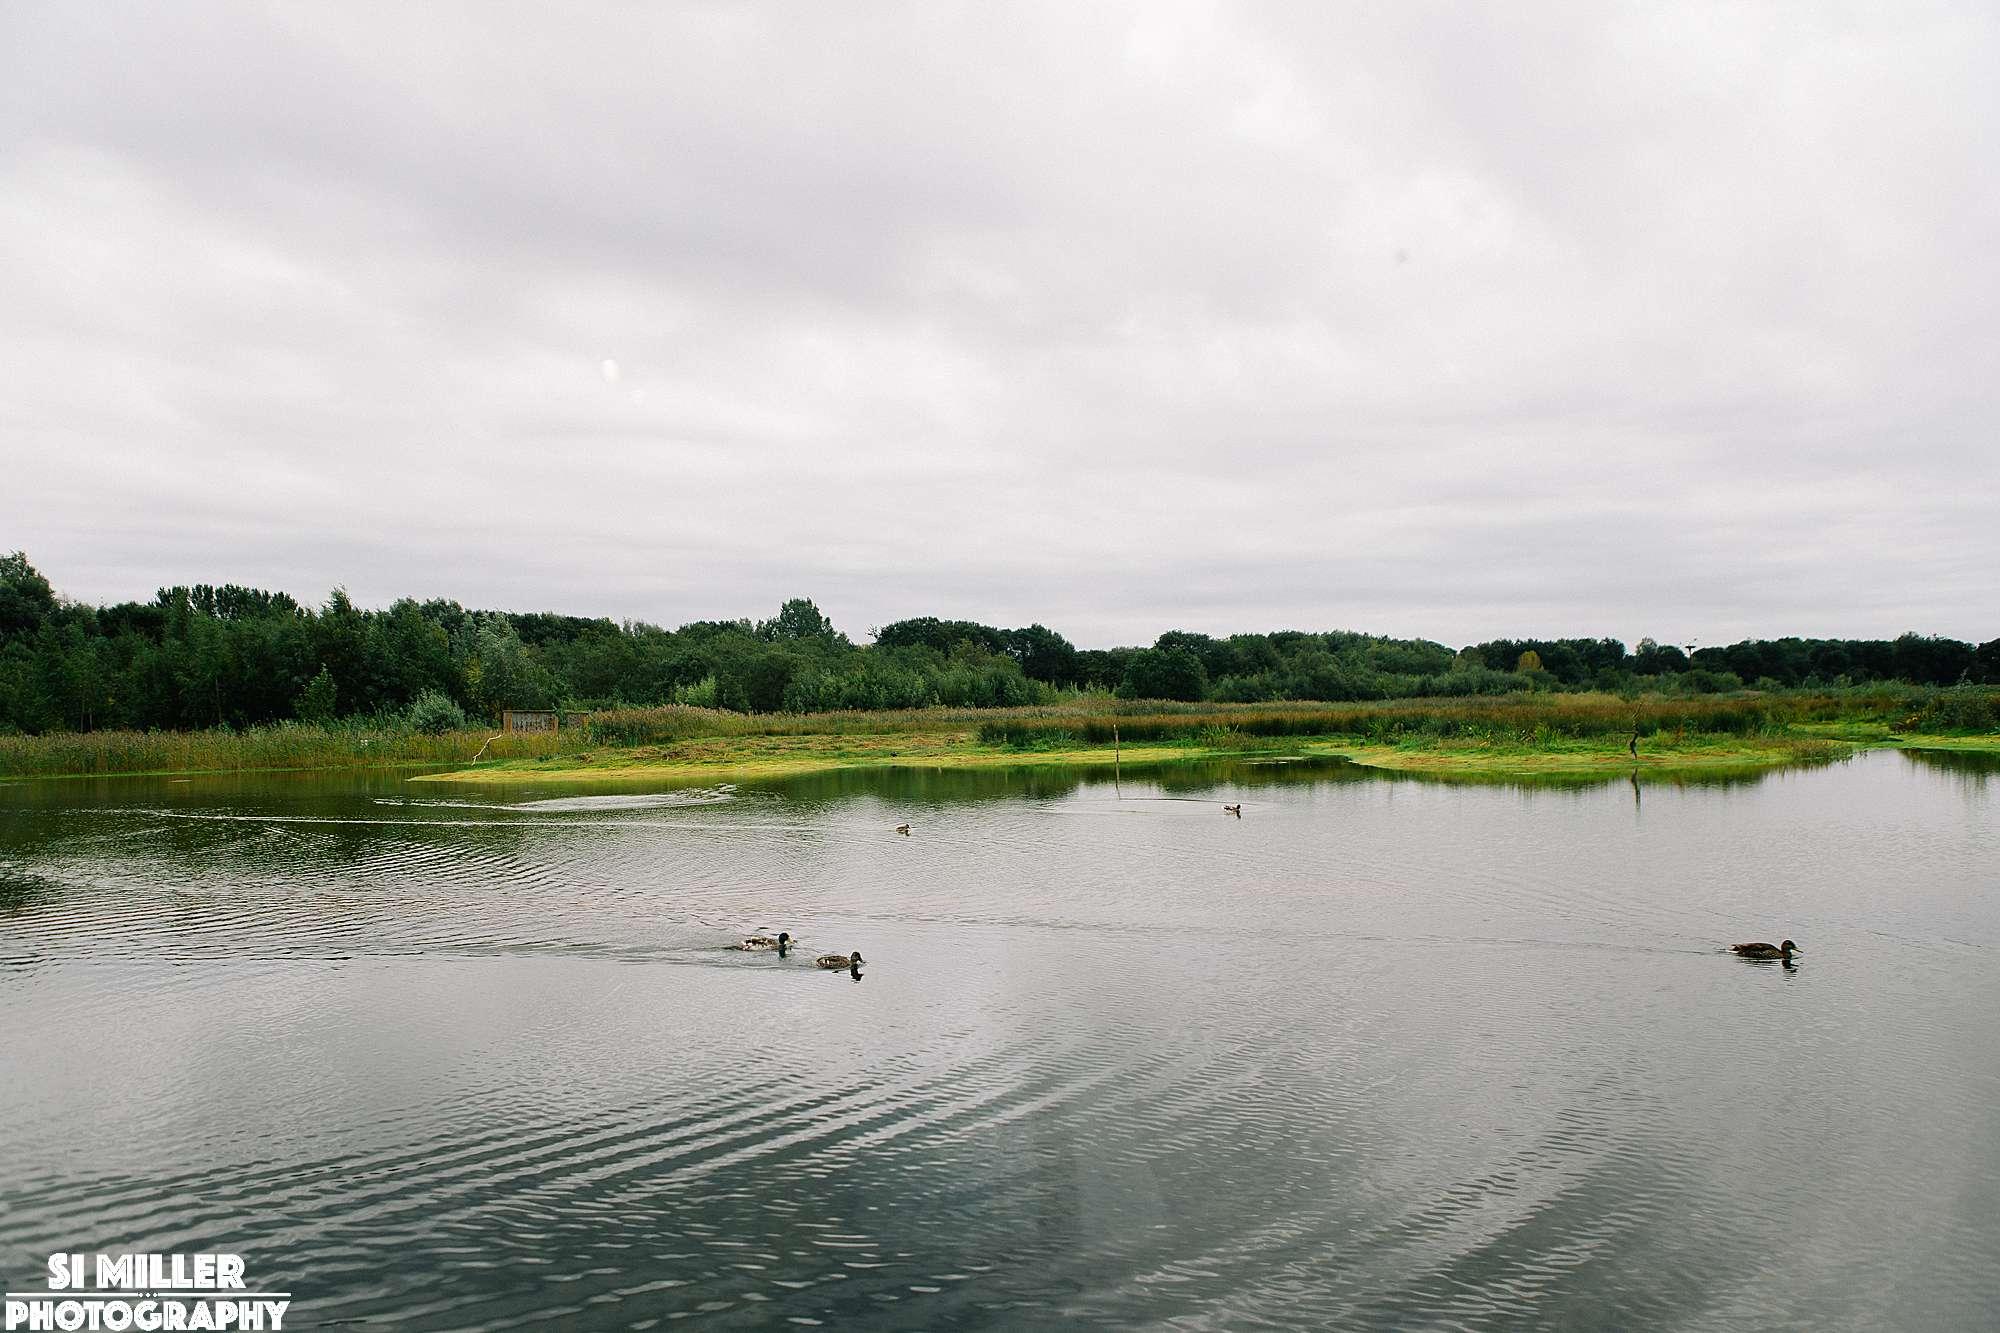 Ducks swimming on lake at brockholes